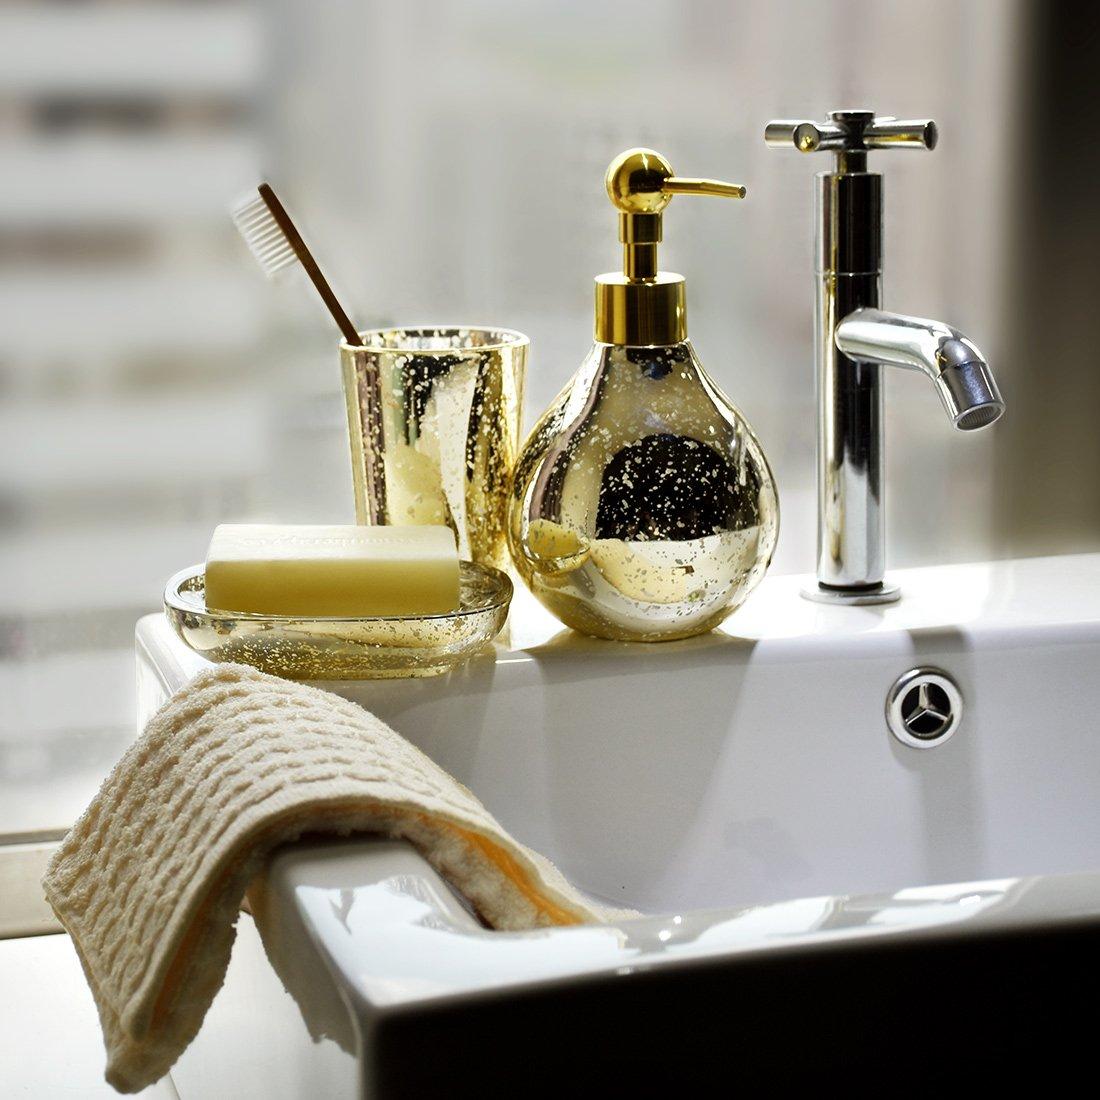 Bathroom accessory set bathroom soap dispenser set - Bathroom accessories soap dispenser ...